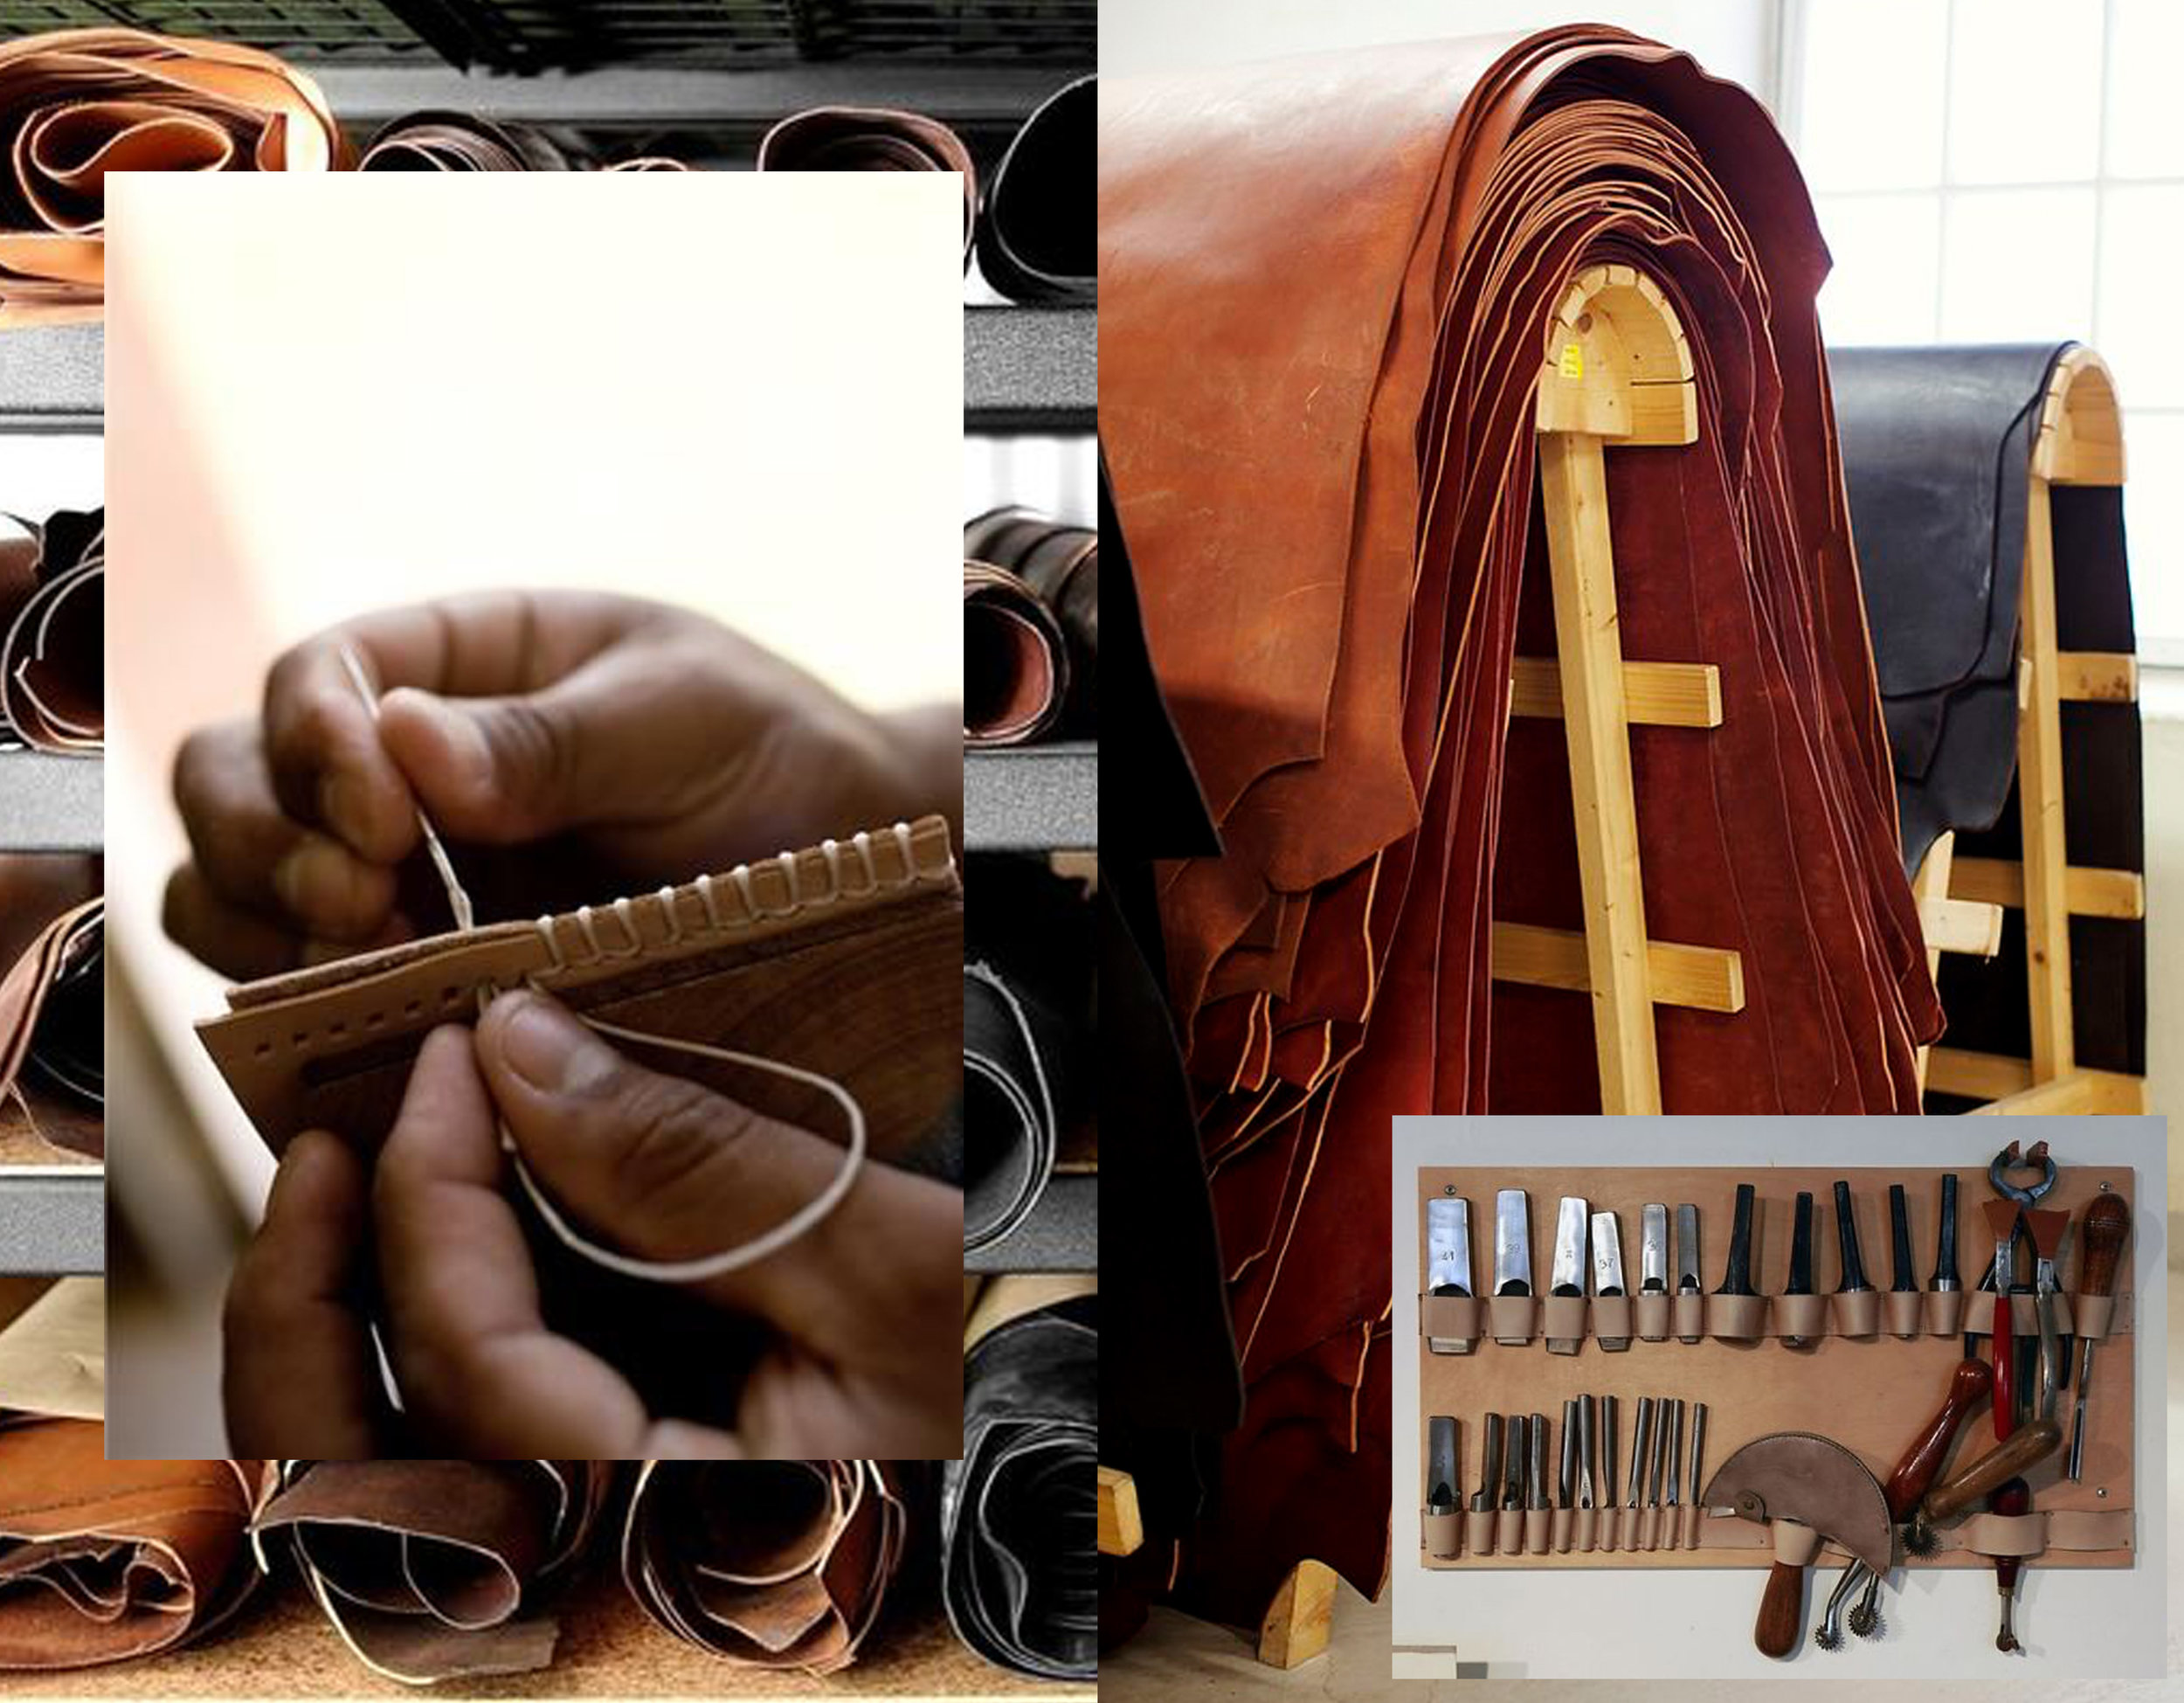 rolls of leather via I nstagram  - hand stitches via  Larru Leathers - leather image via  Lantliv  - tools via  Feather Factors